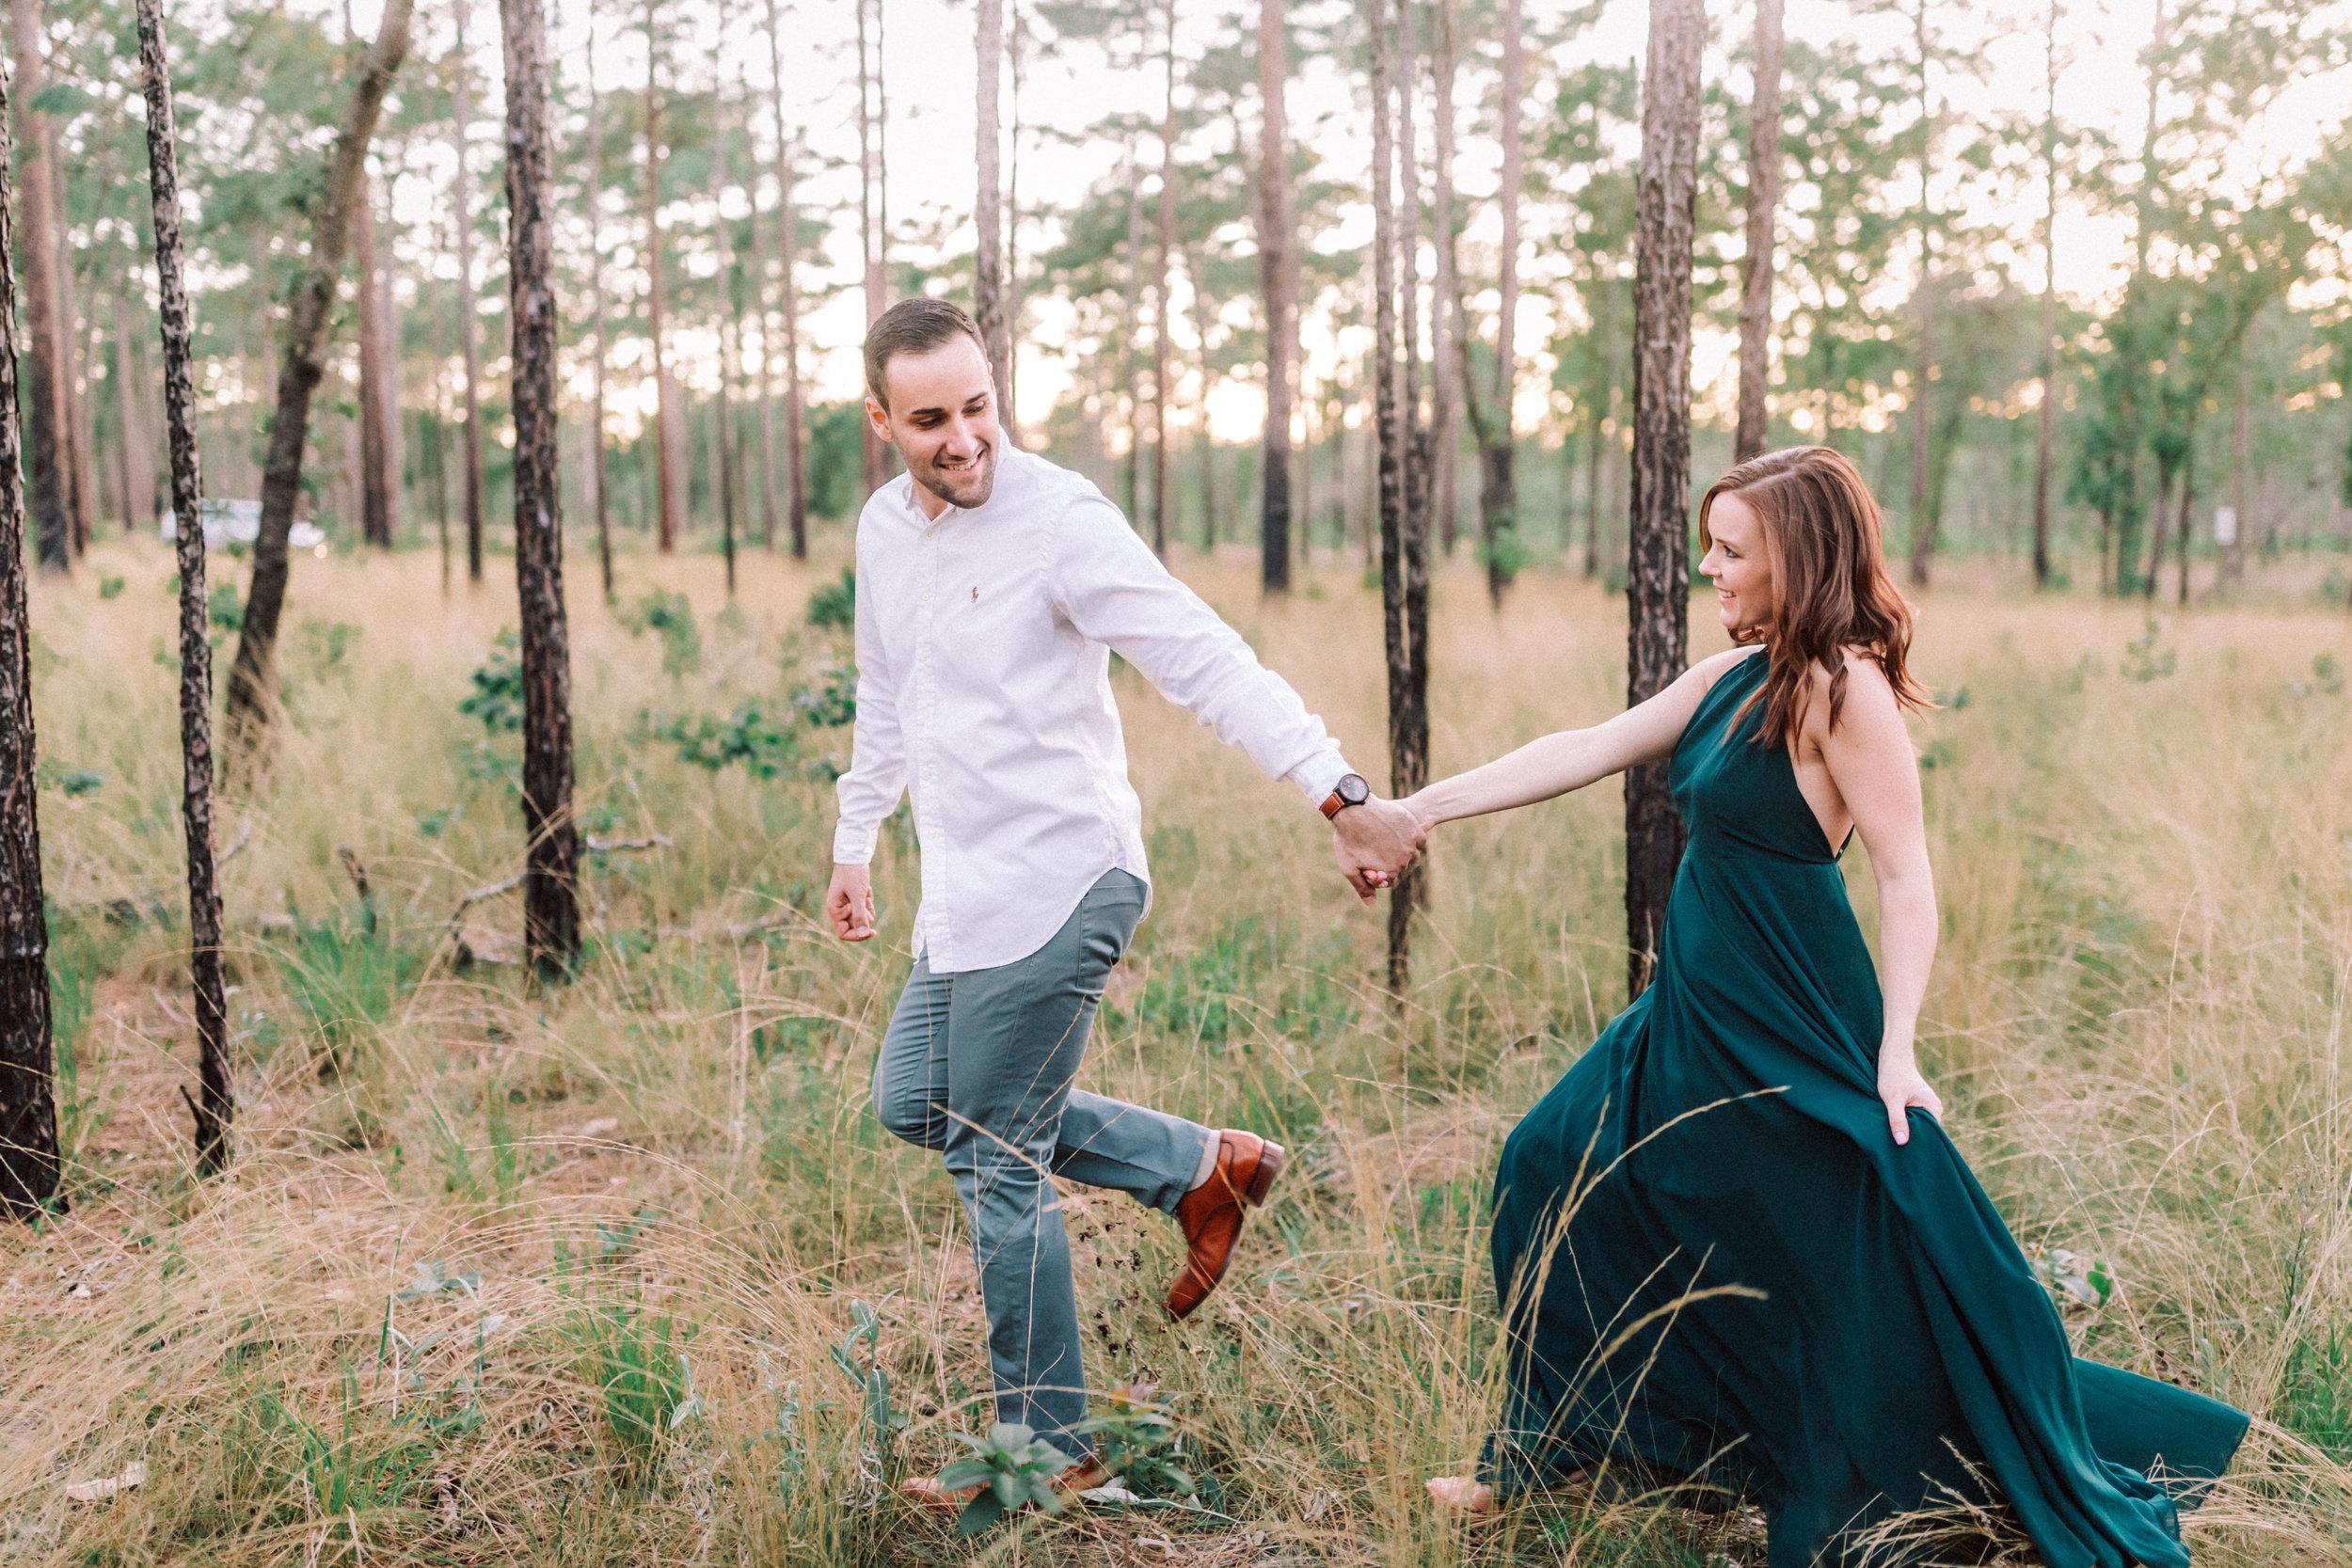 Orlando Engagement session at Wekiva Springs State Park nature-Anthony + Christine 40.jpg